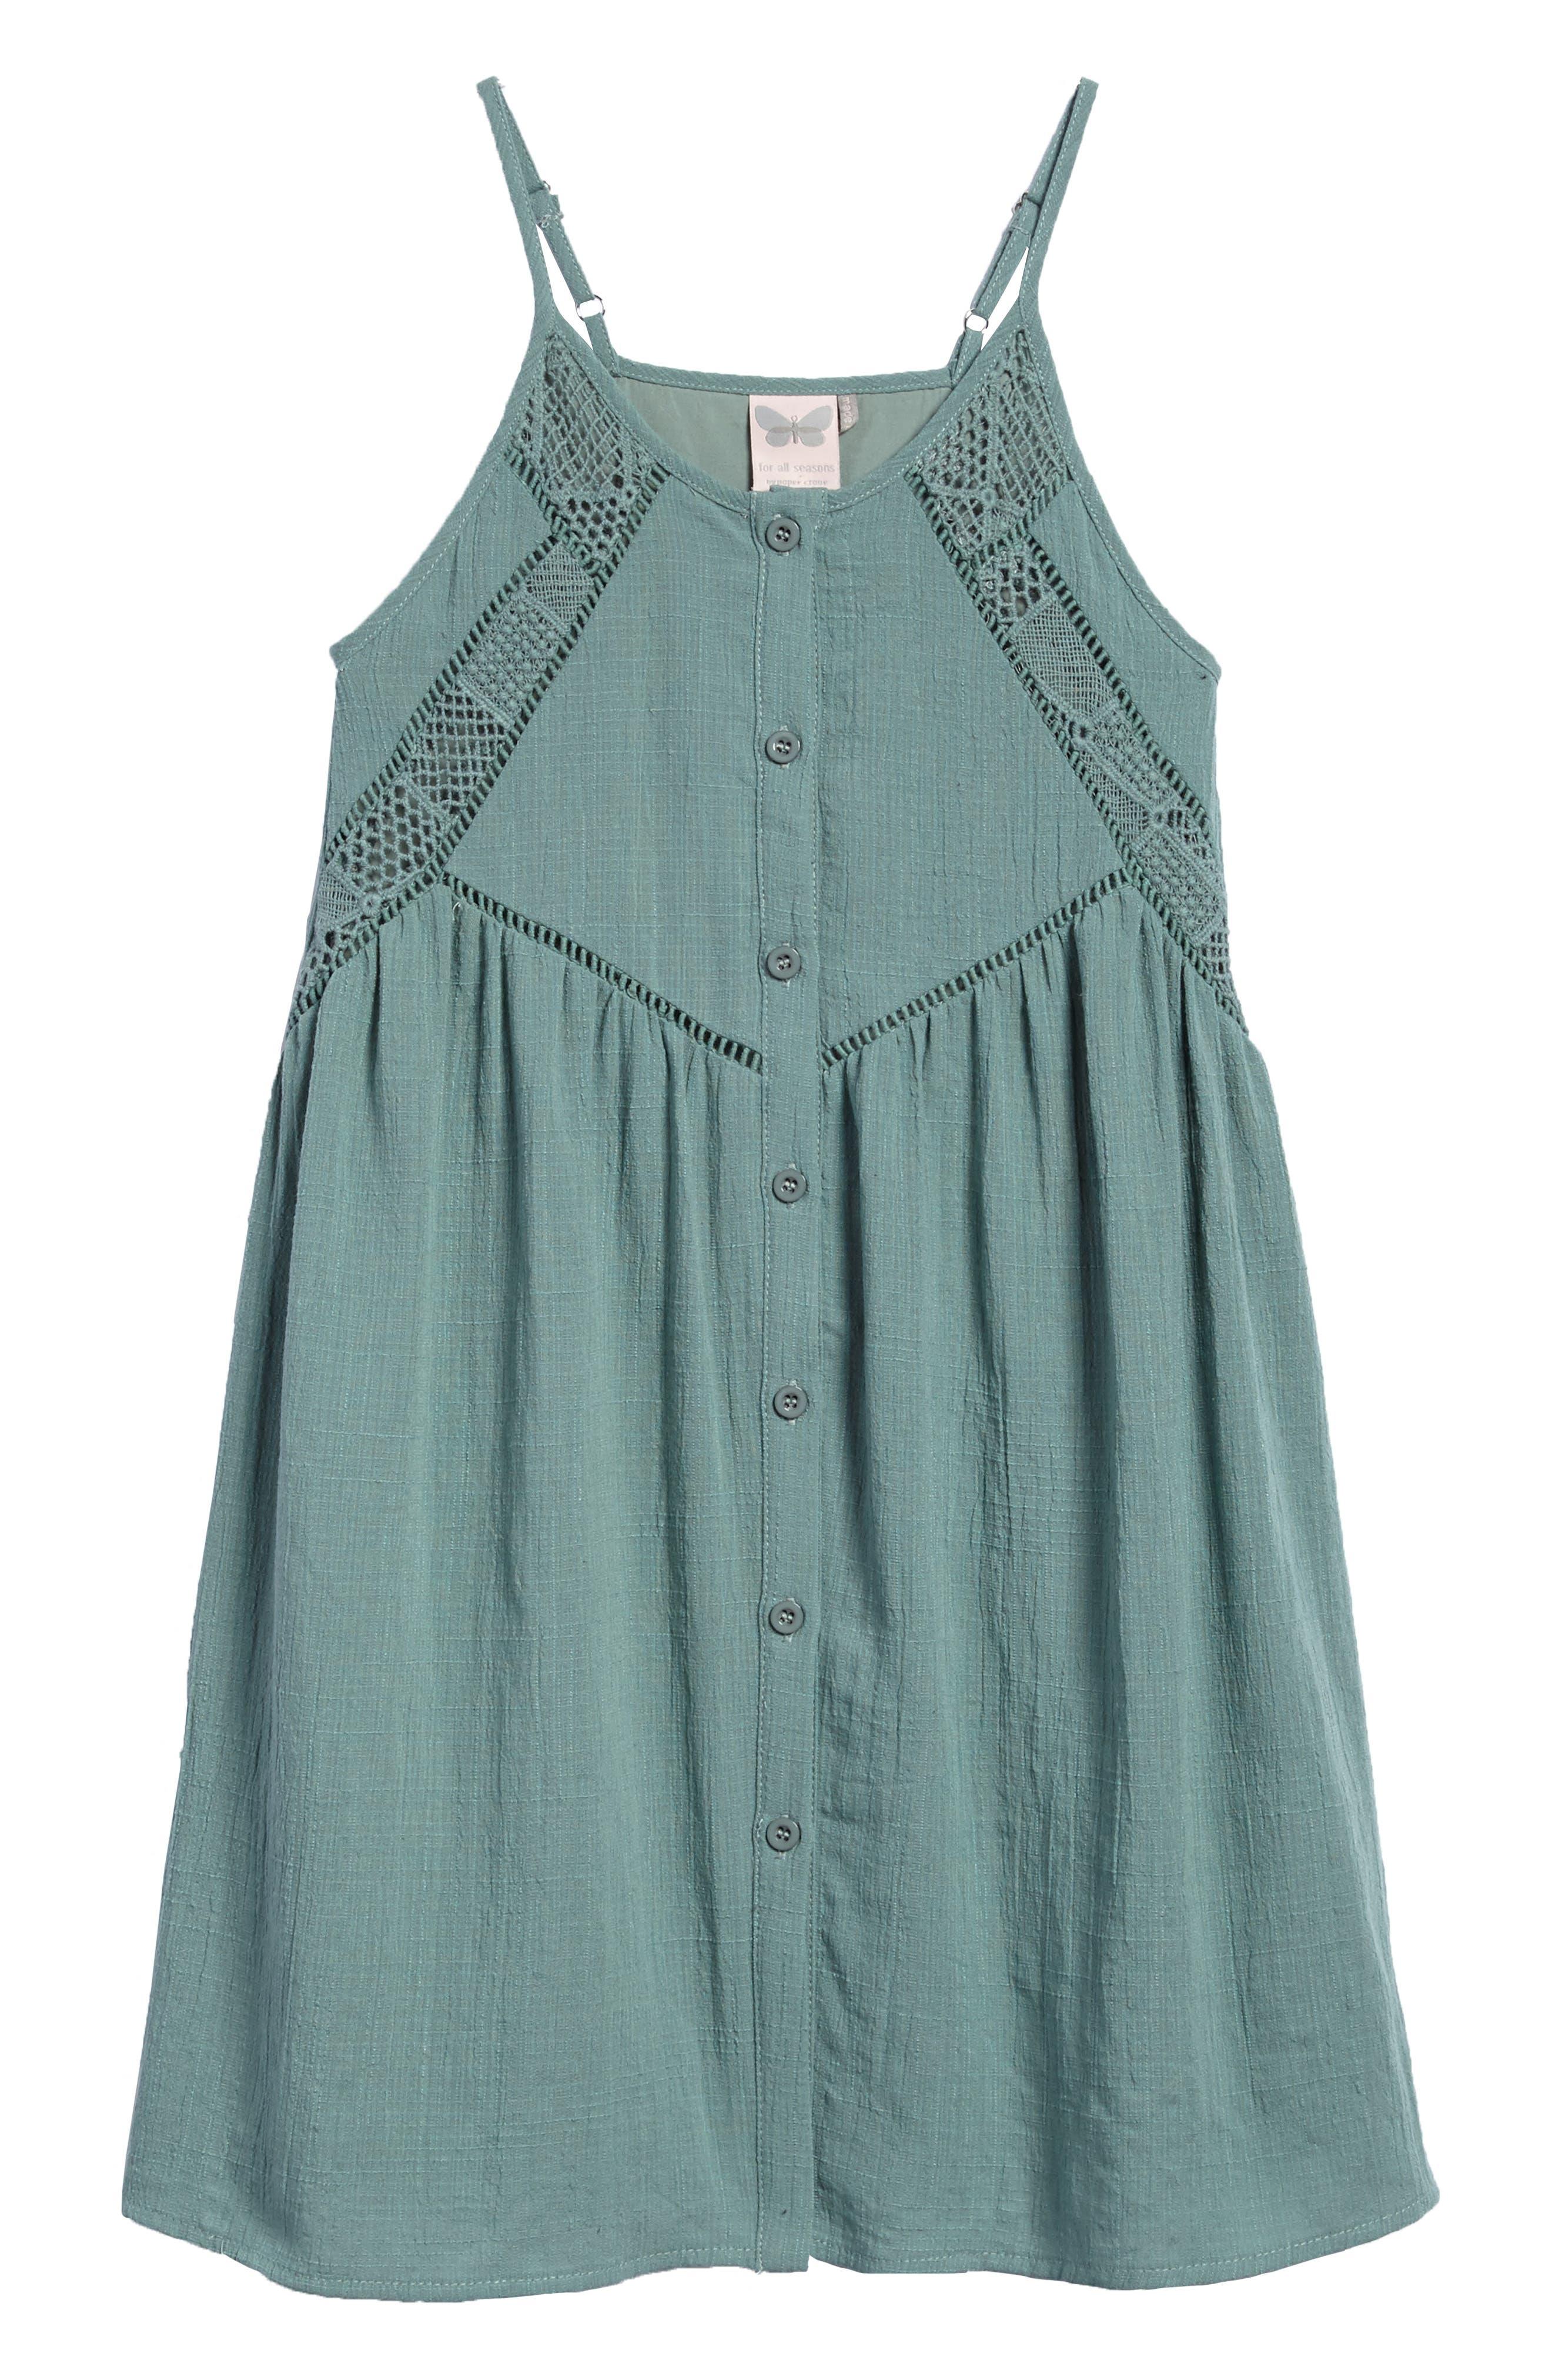 Alternate Image 1 Selected - For All Season Woven Tank Dress (Big Girls)